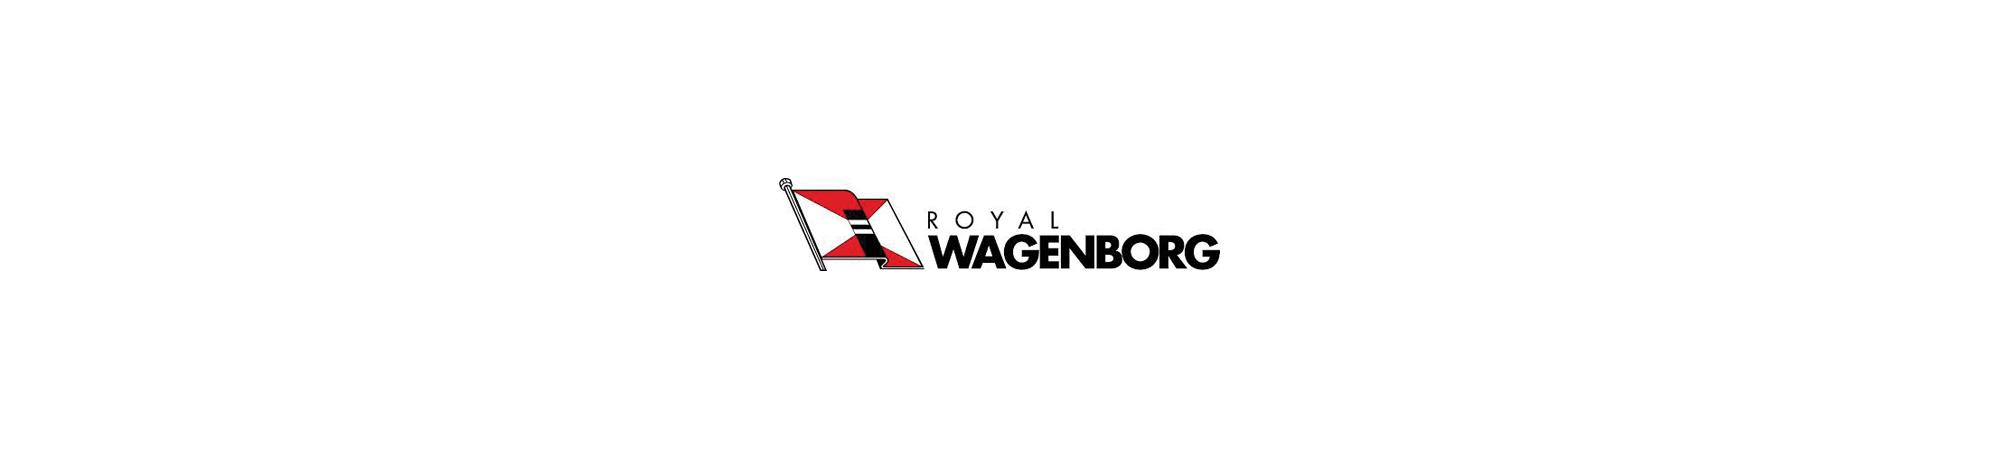 royalwagenborg.png